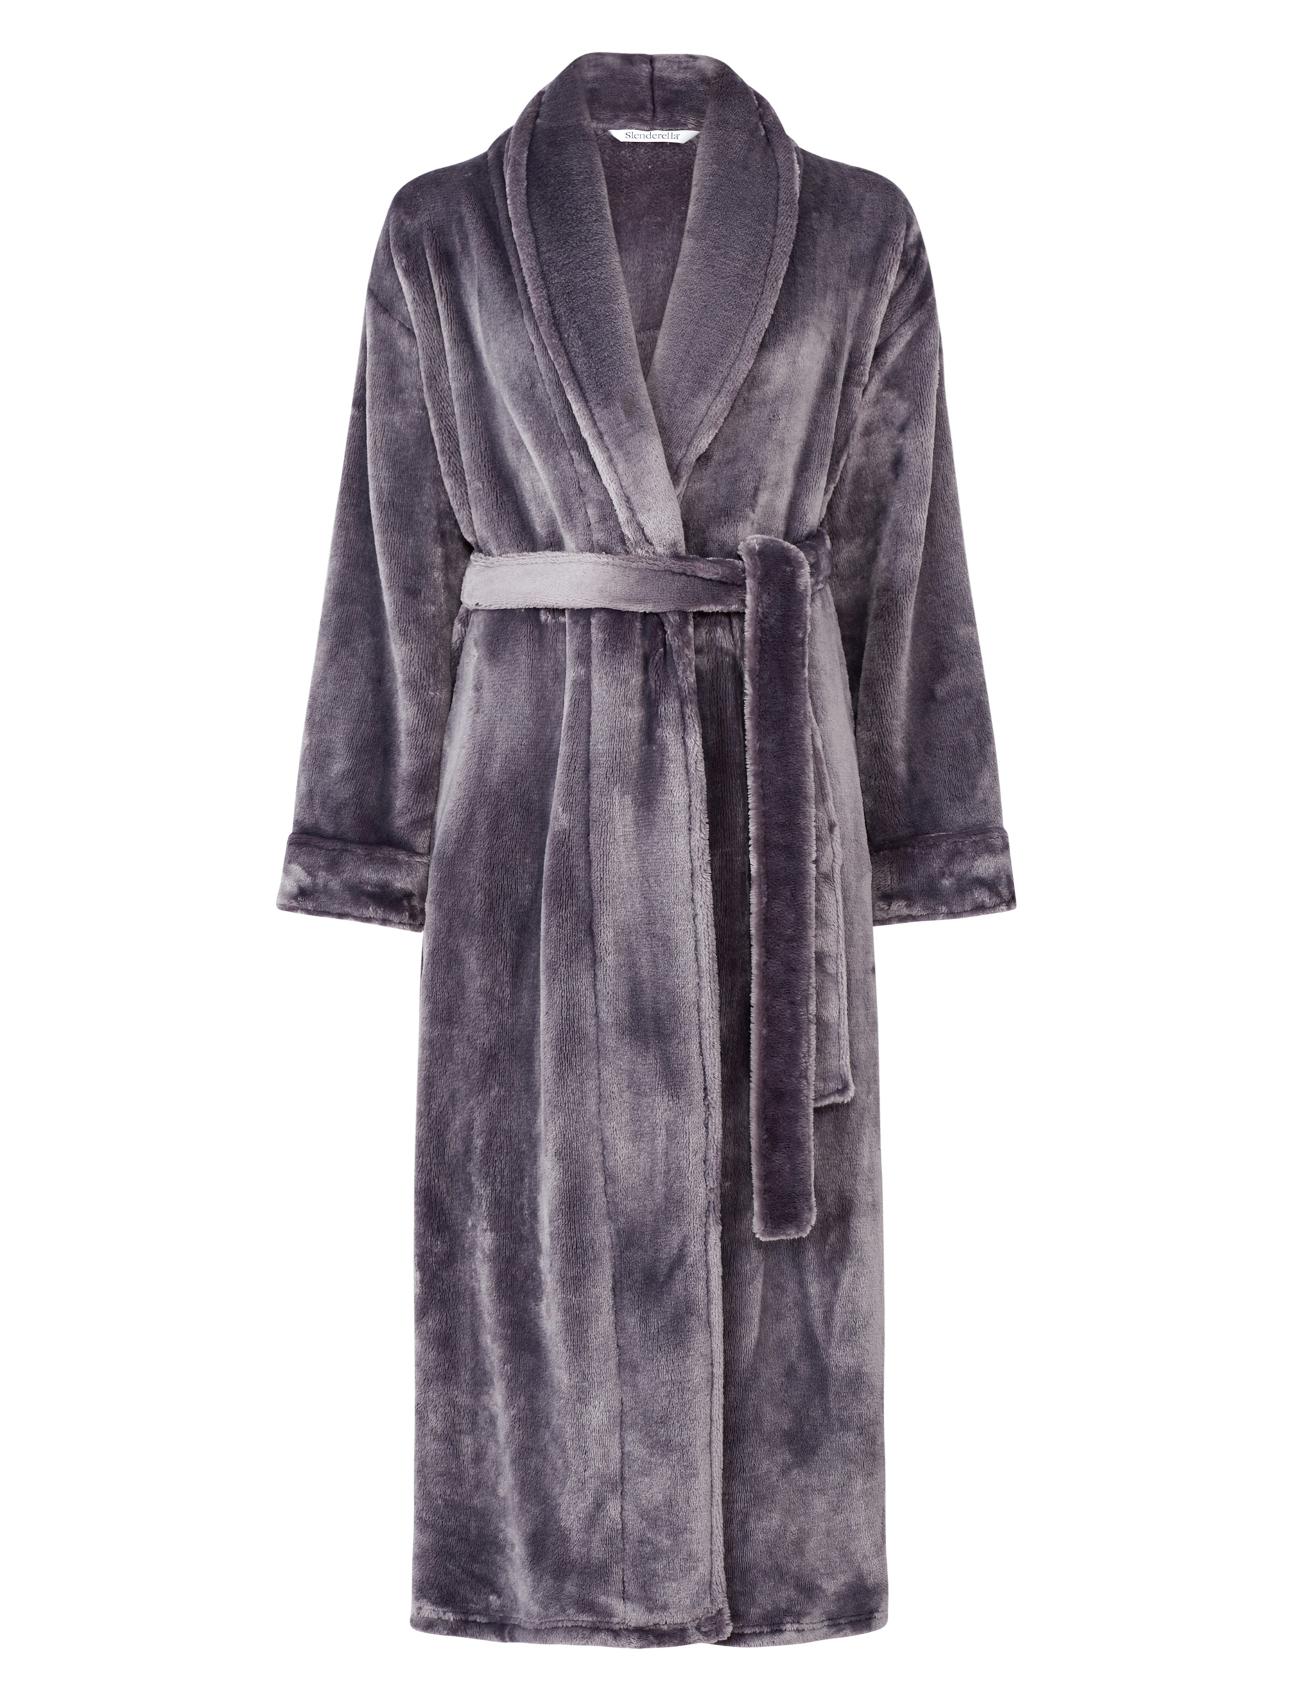 Slenderella Ladies Super Soft Thick Fleece Dressing Gown Shawl ...